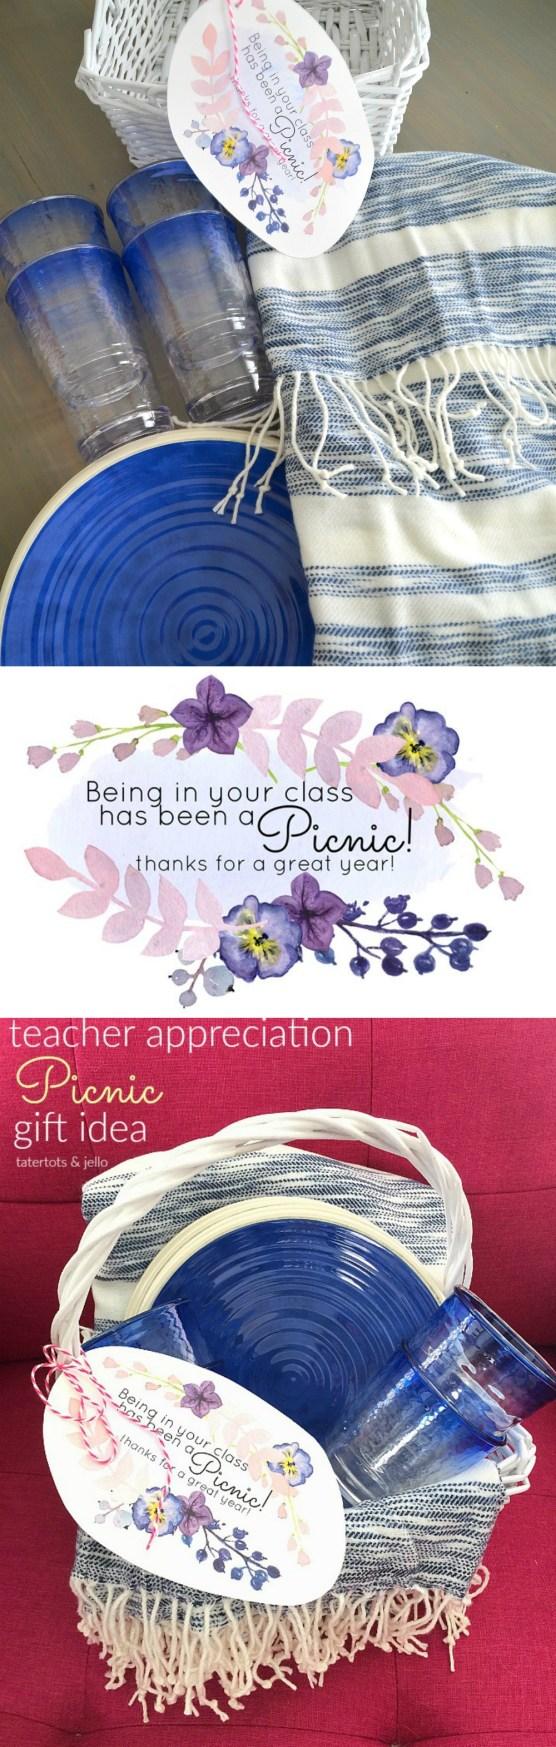 Teacher Appreciation Picnic Gift Idea Printable Tag